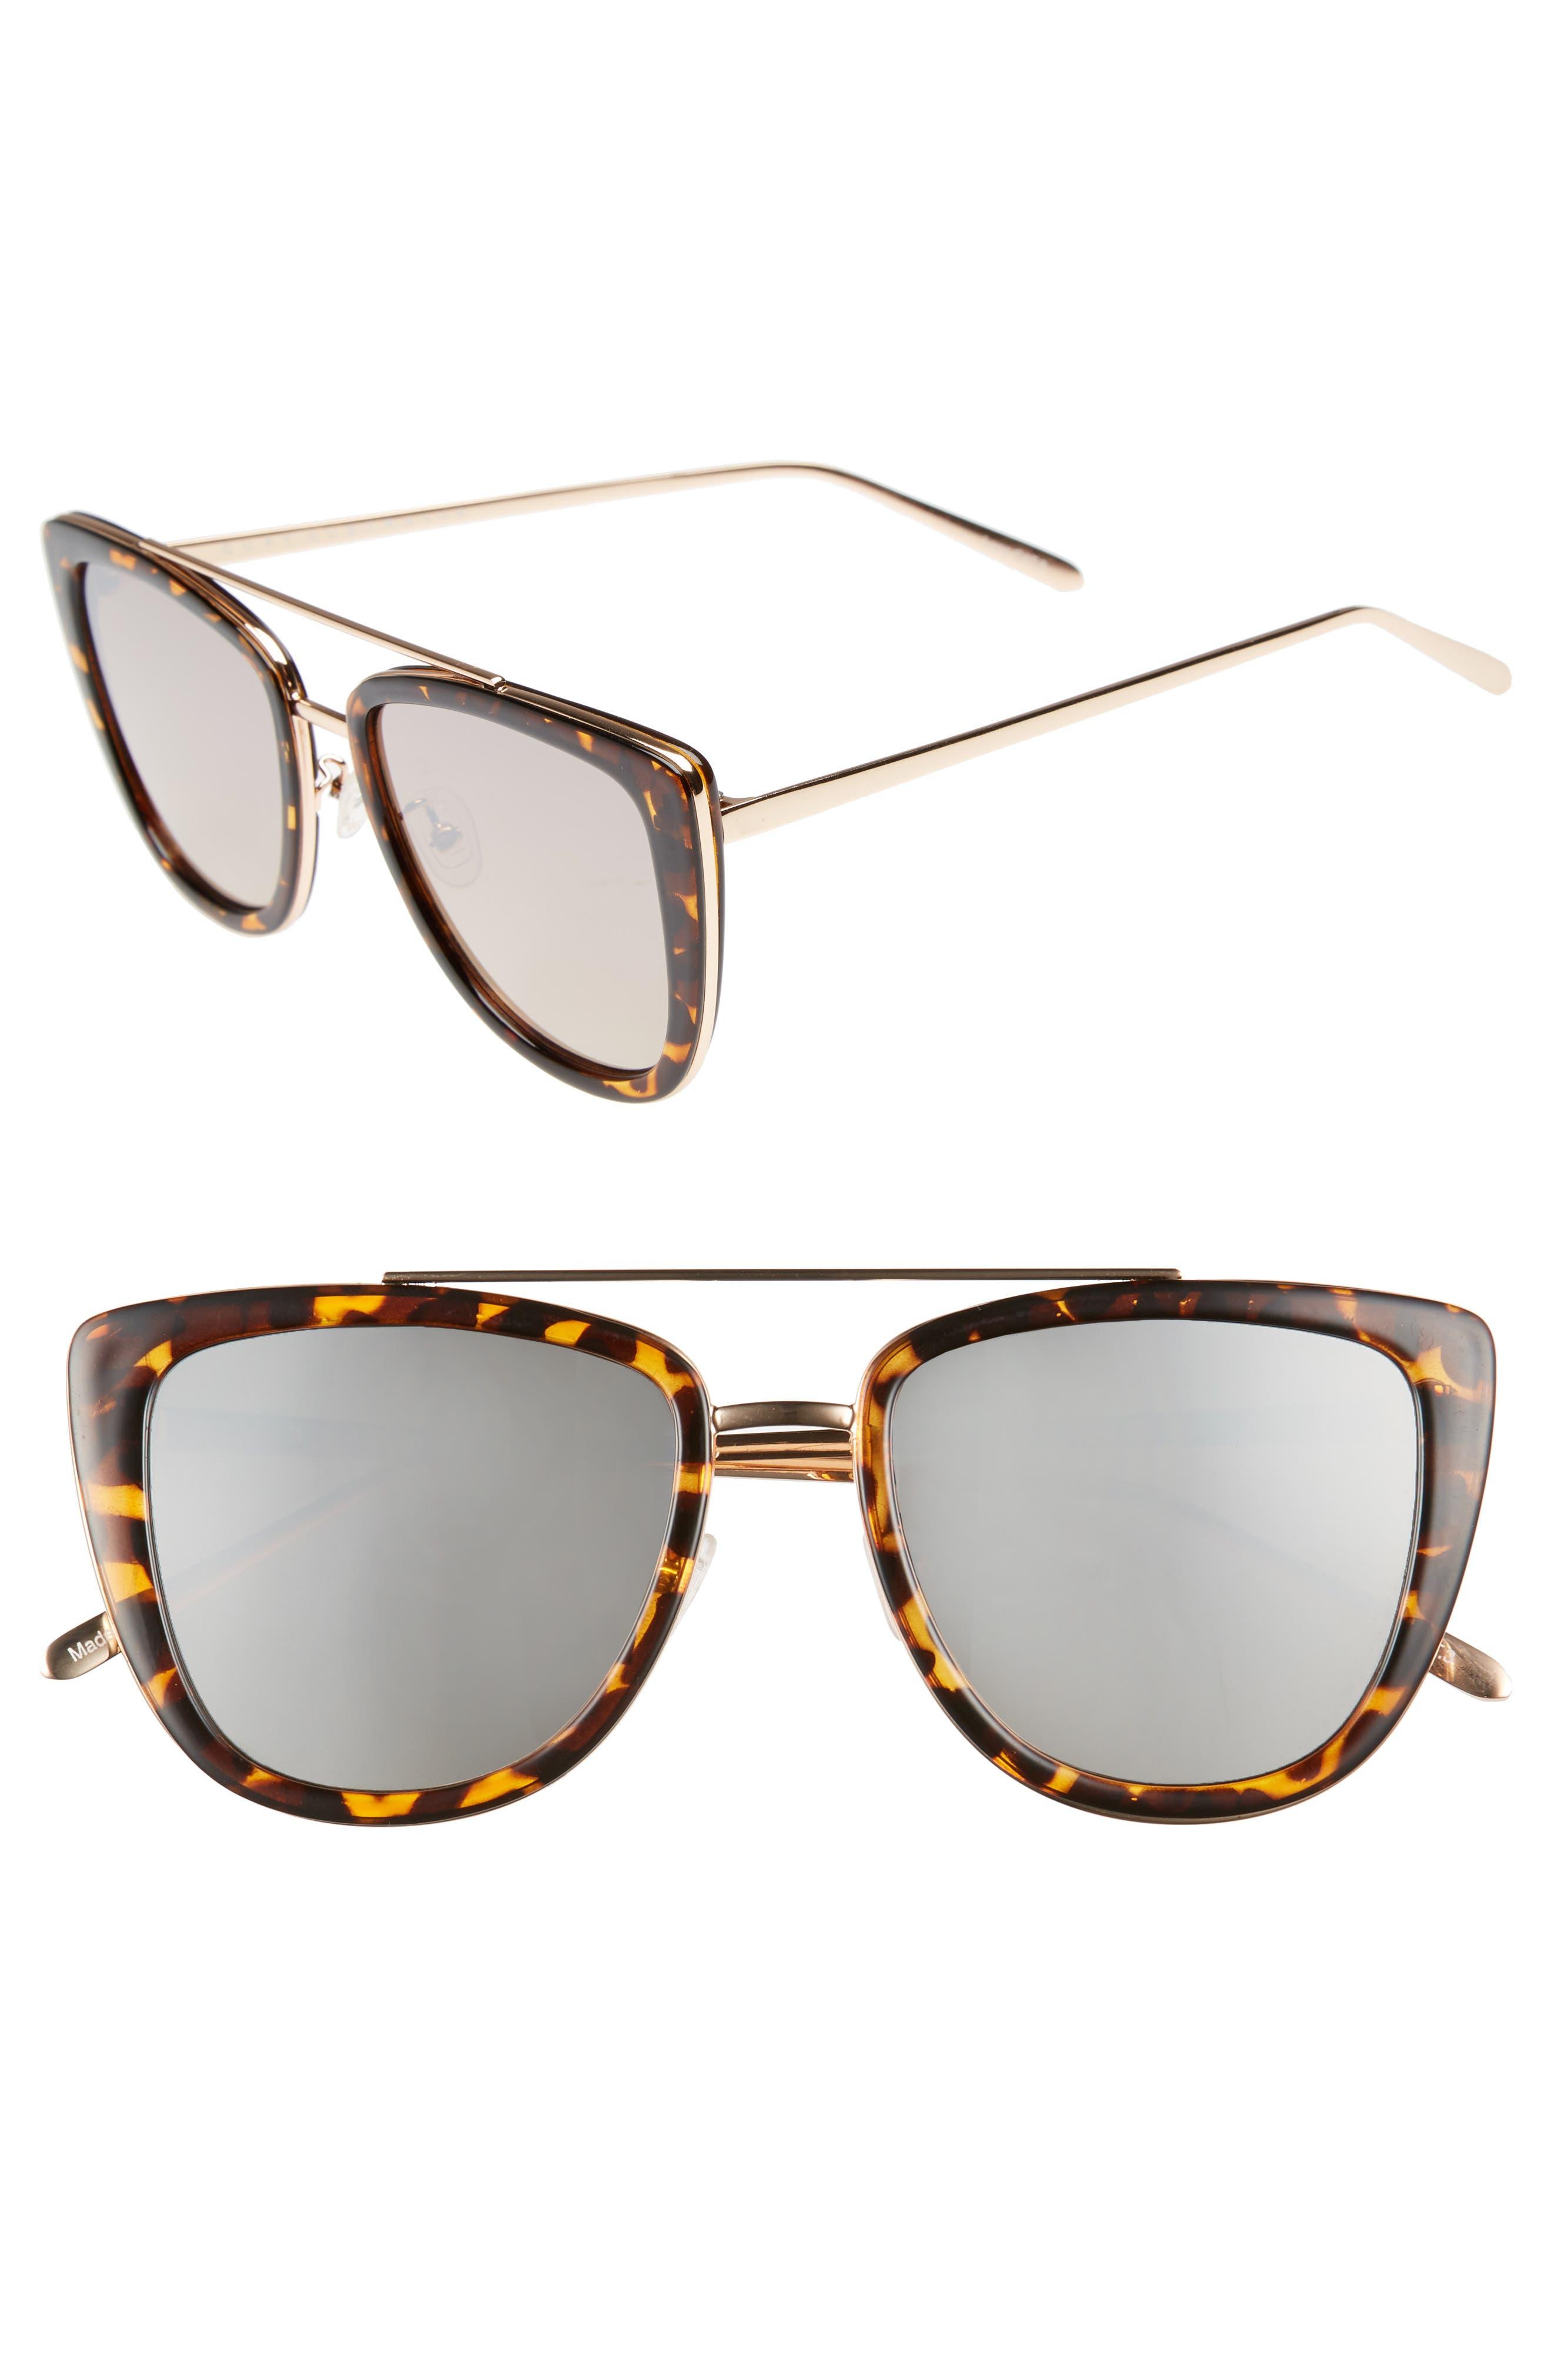 French Kiss 55mm Cat Eye Sunglasses,                             Main thumbnail 1, color,                             TORT/GOLD